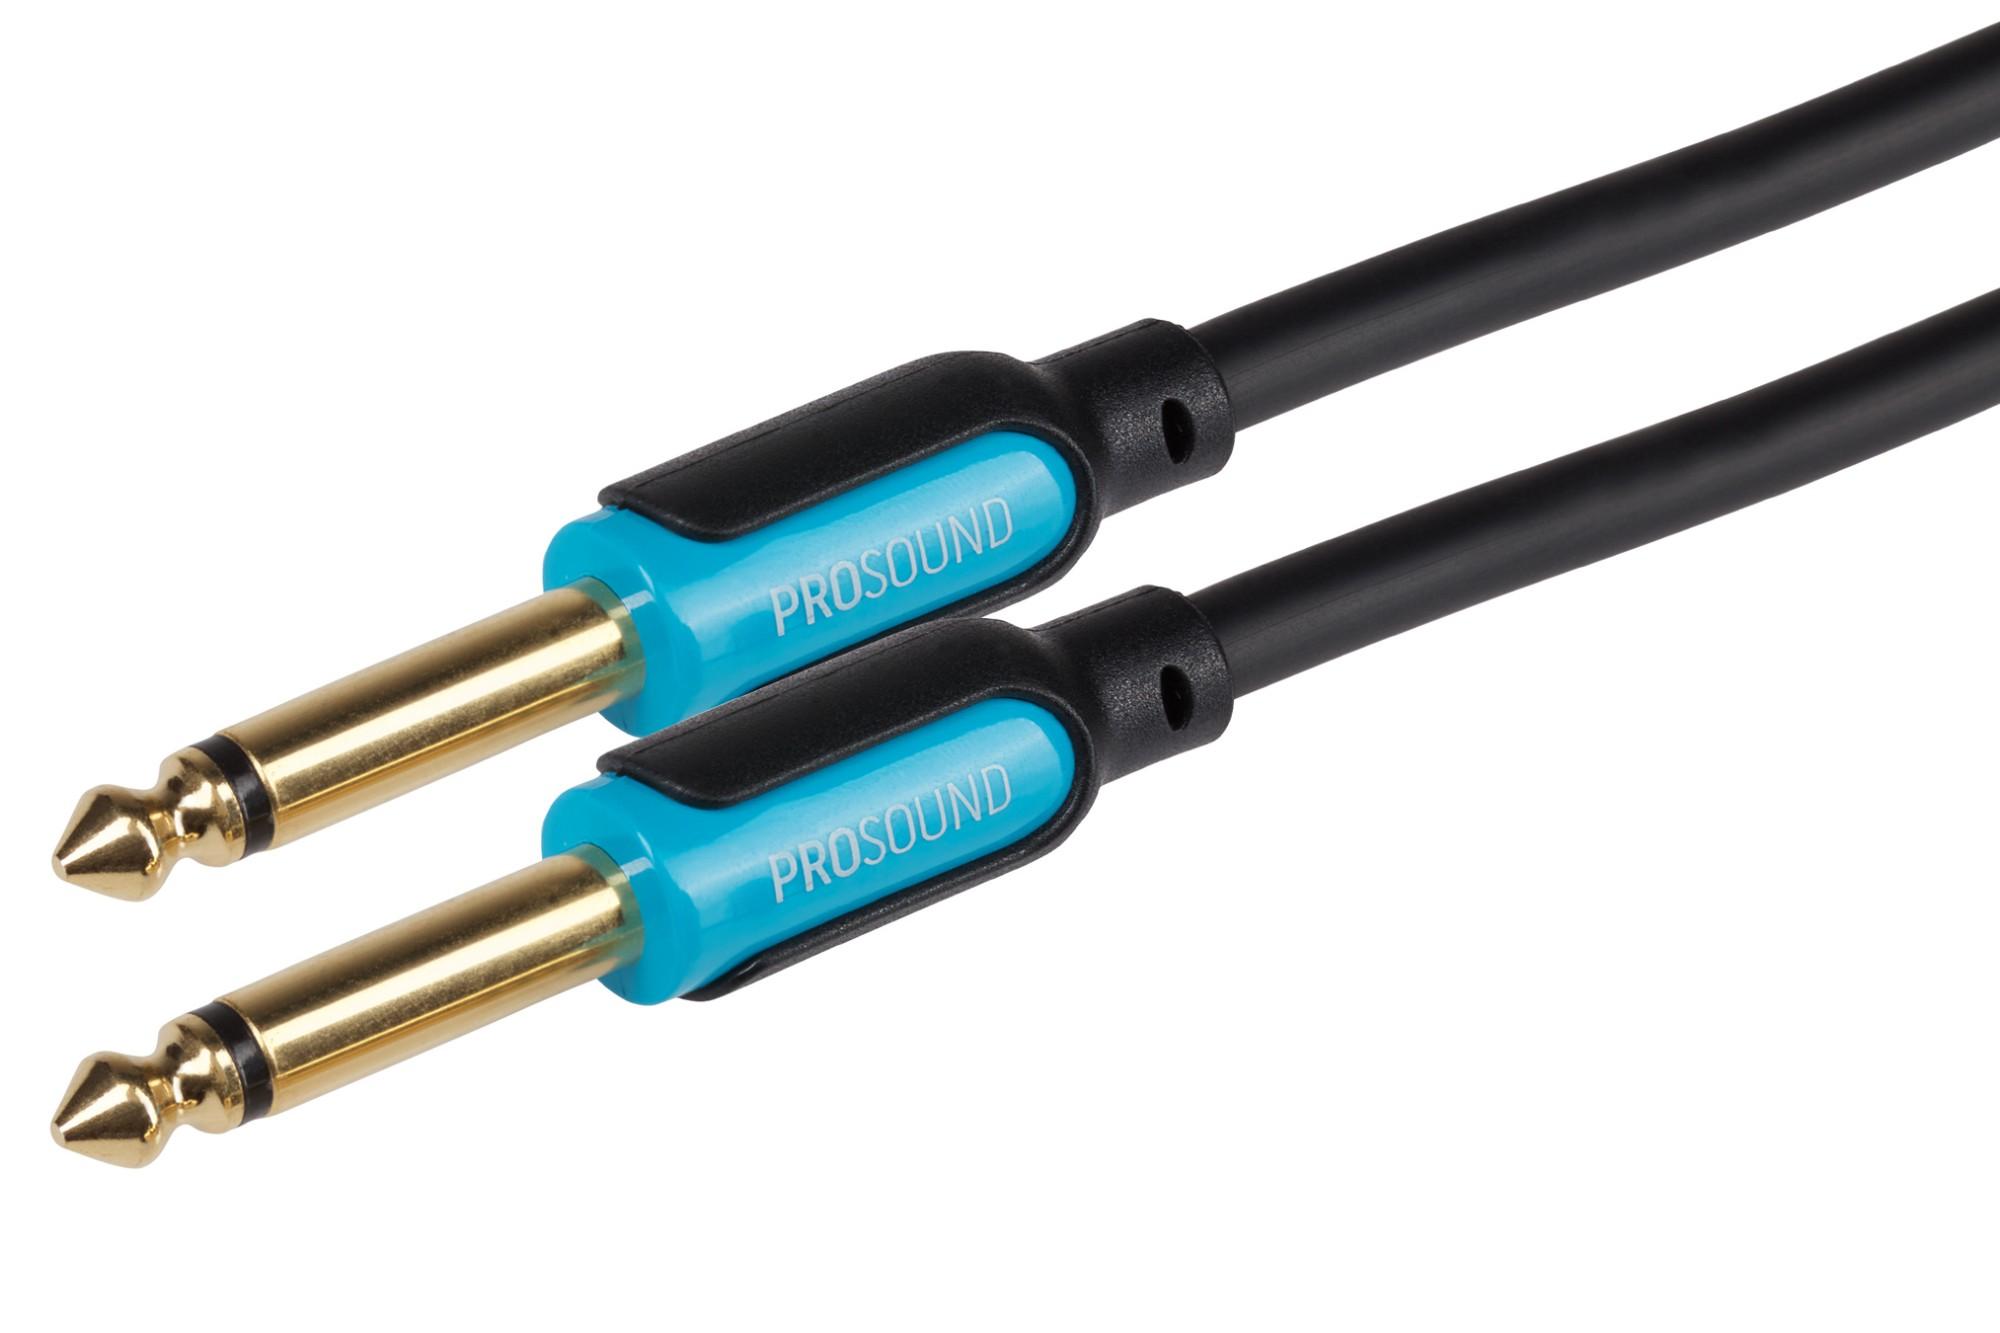 ProSound 0.25 Inch Mono 2 Pole Jack to 0.25 Inch Mono 2 Pole Jack Cable (5m)